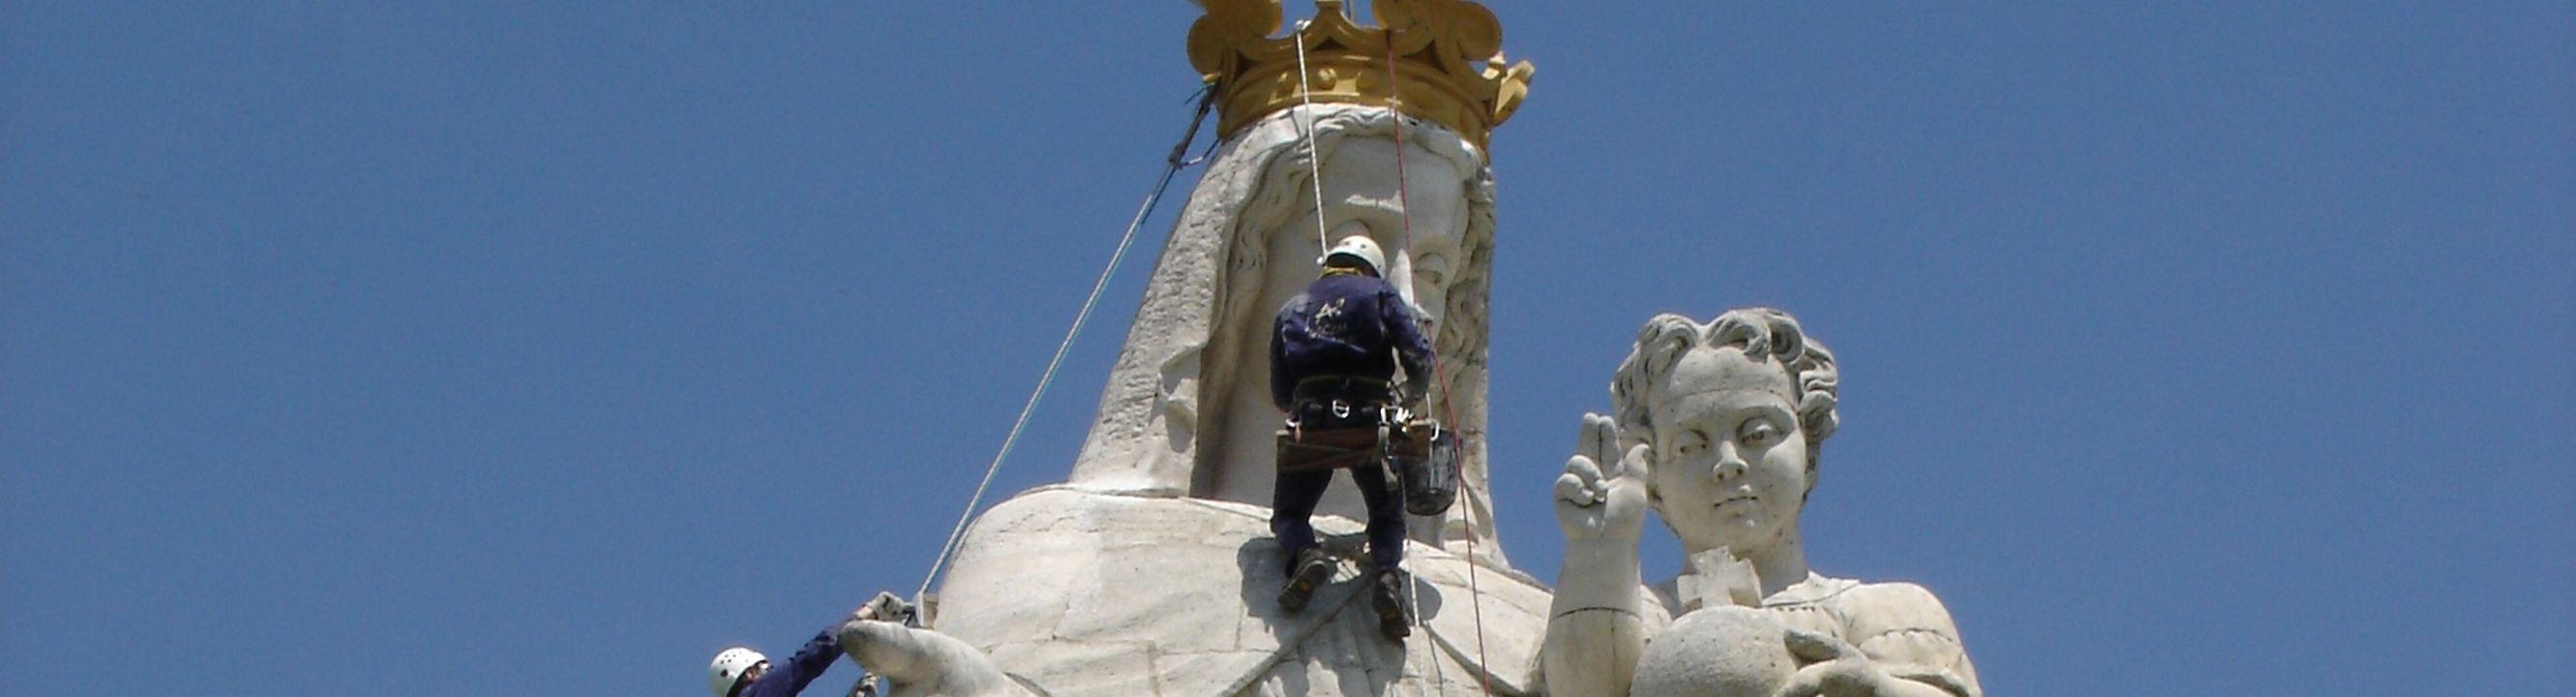 technicien cordiste paris urbain mission acts interim